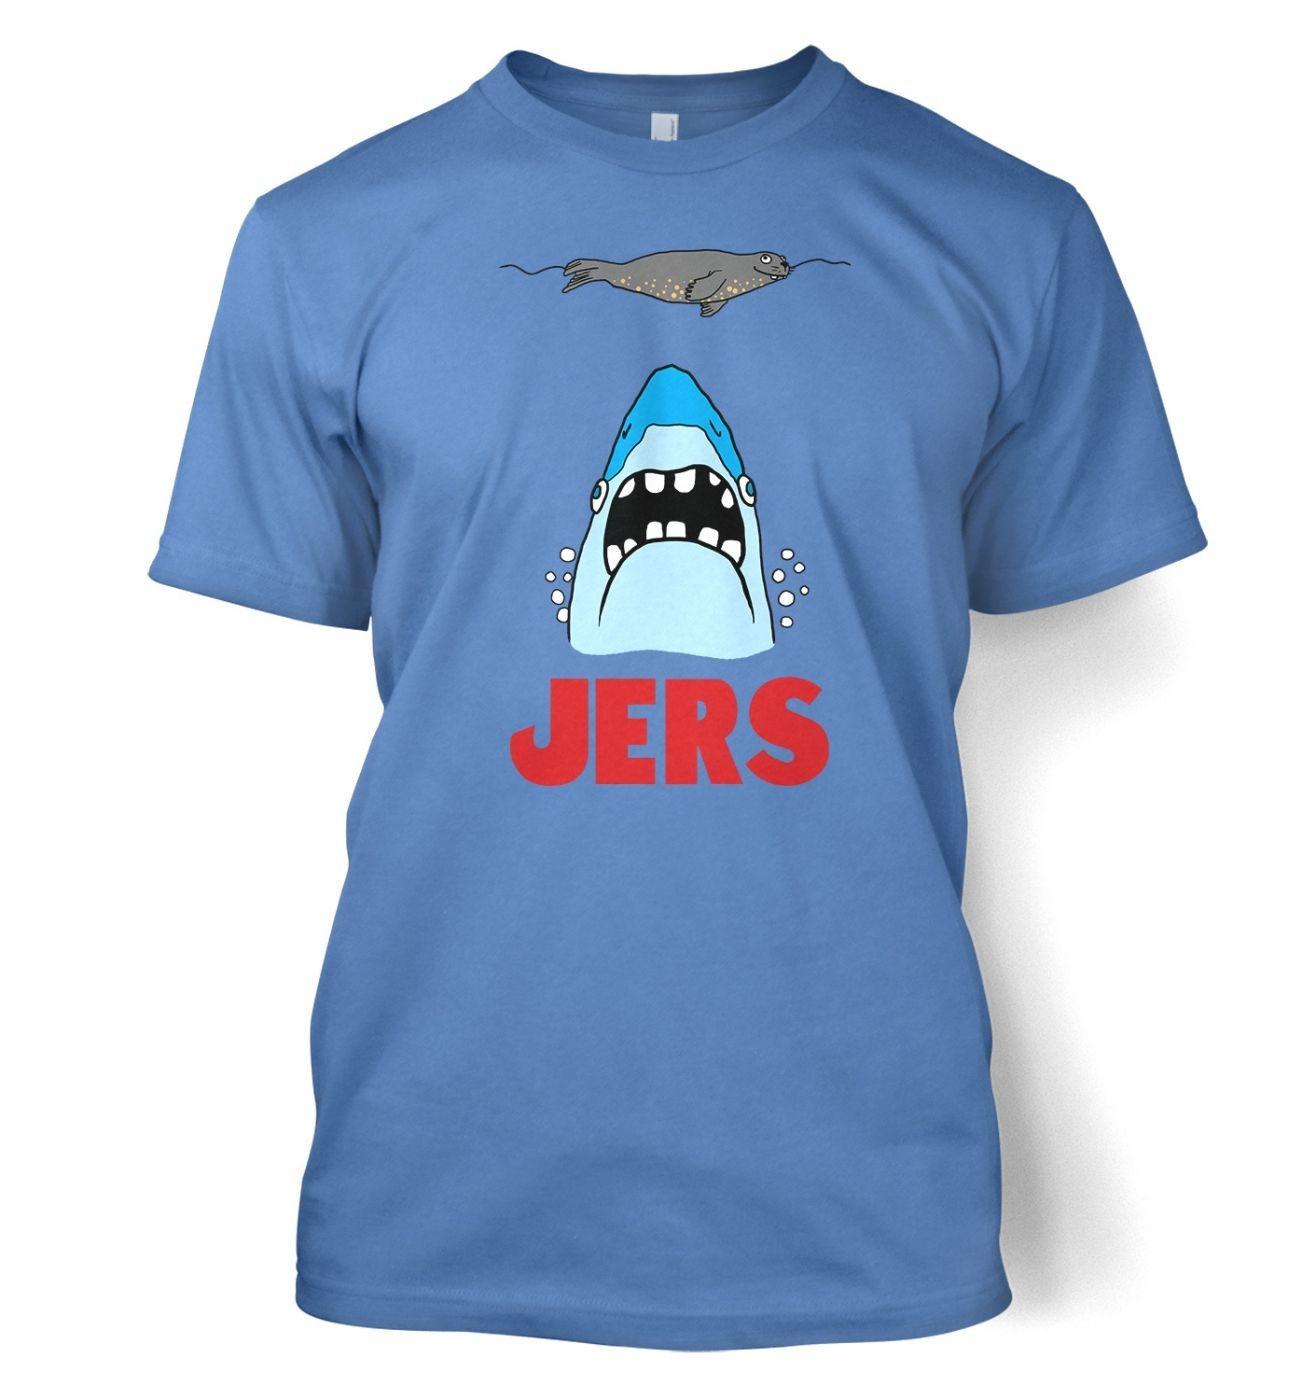 Jers t-shirt